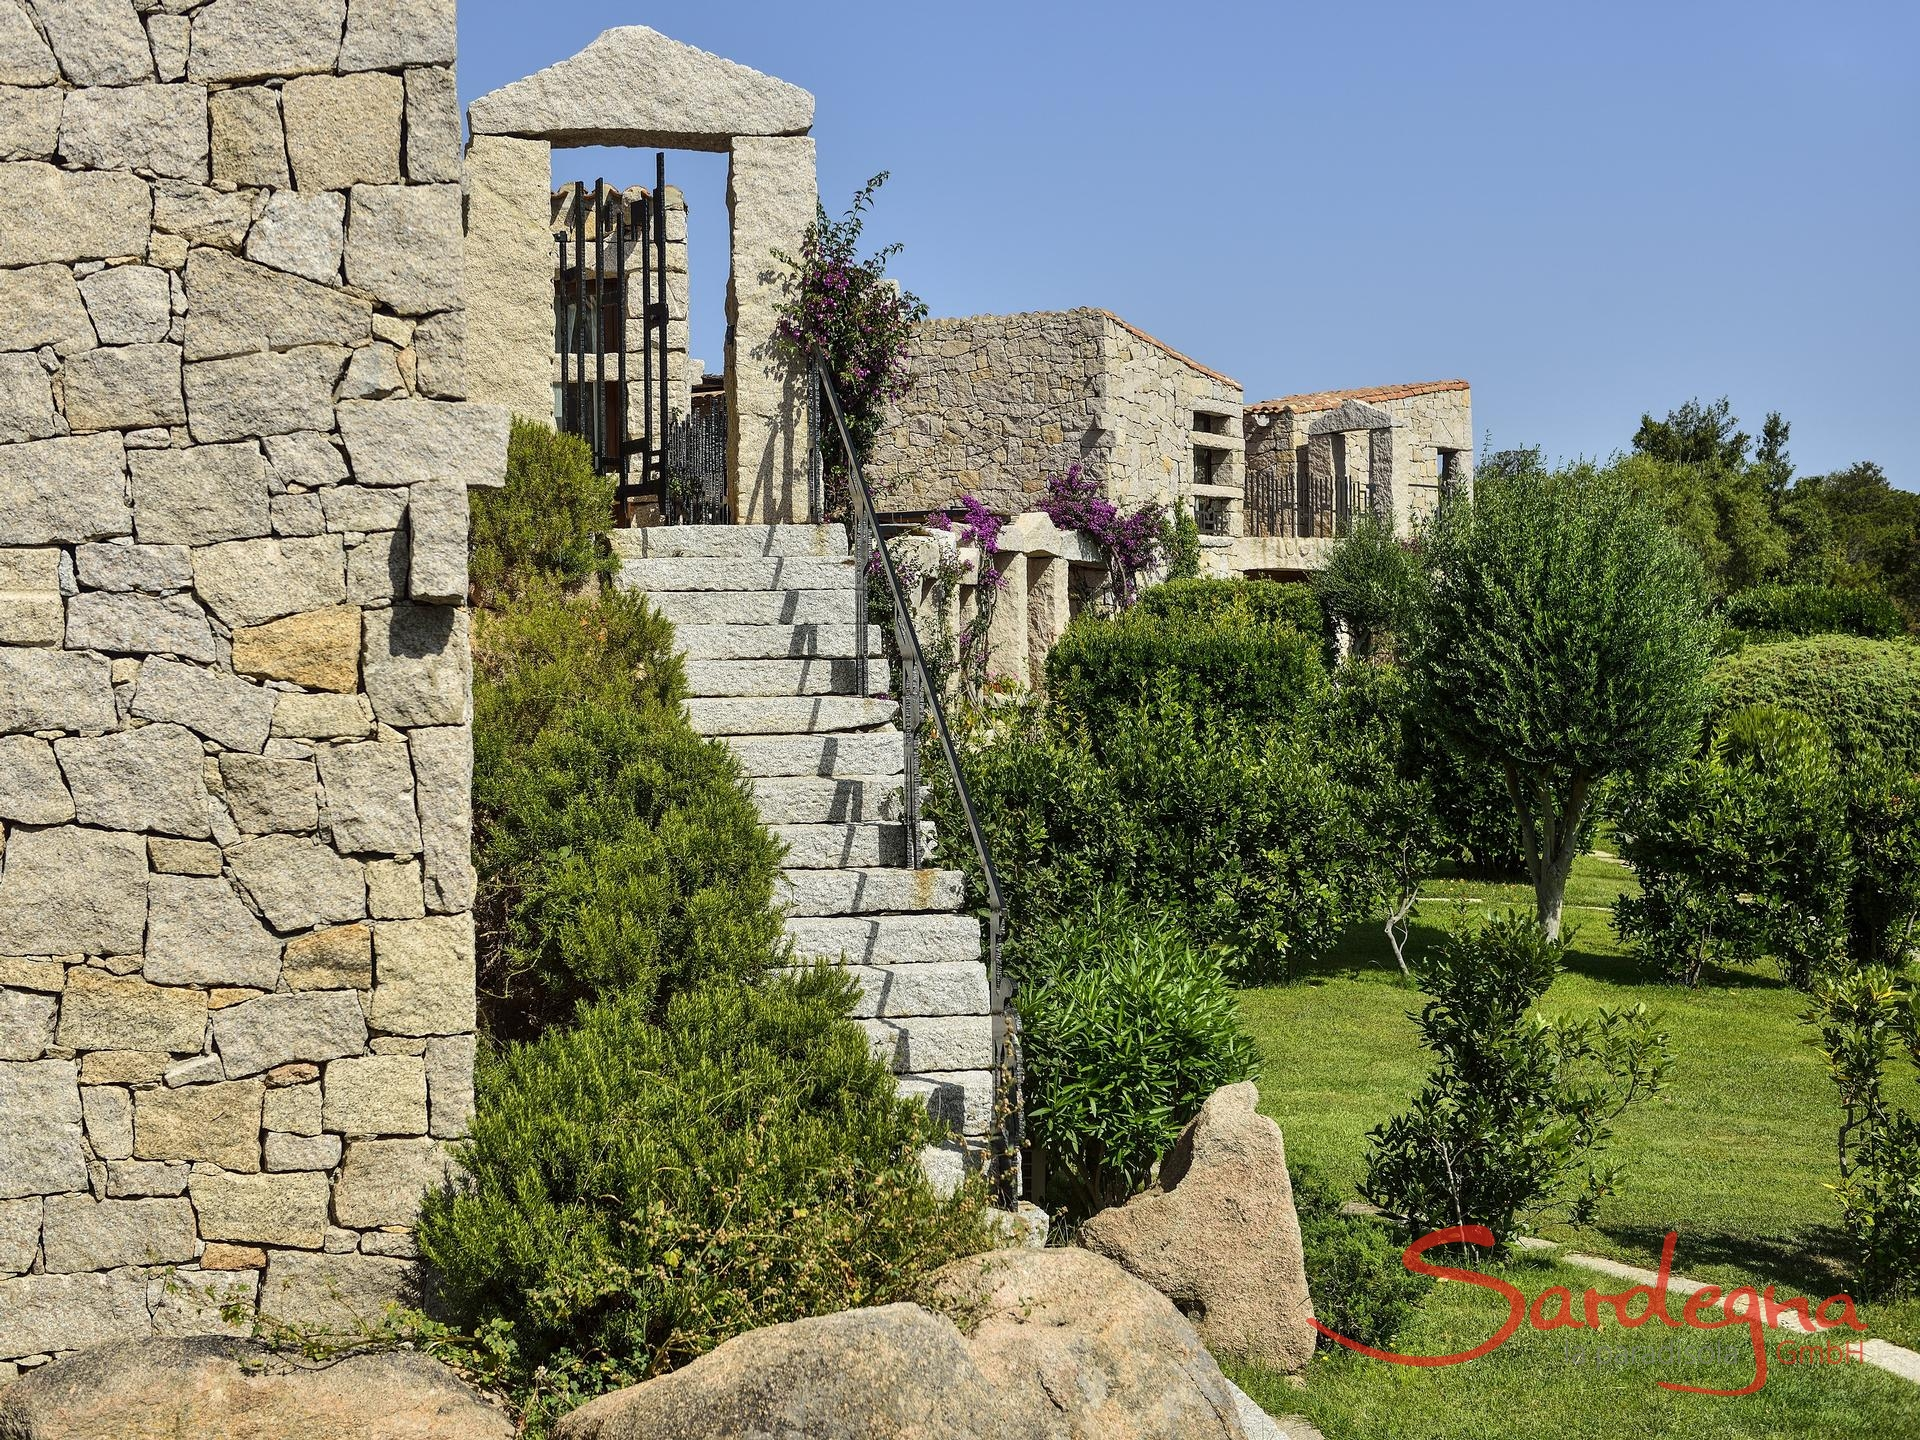 Ferienhaus Villa Domus 16 Costa Smeralda Sardinien 5b41960bc403